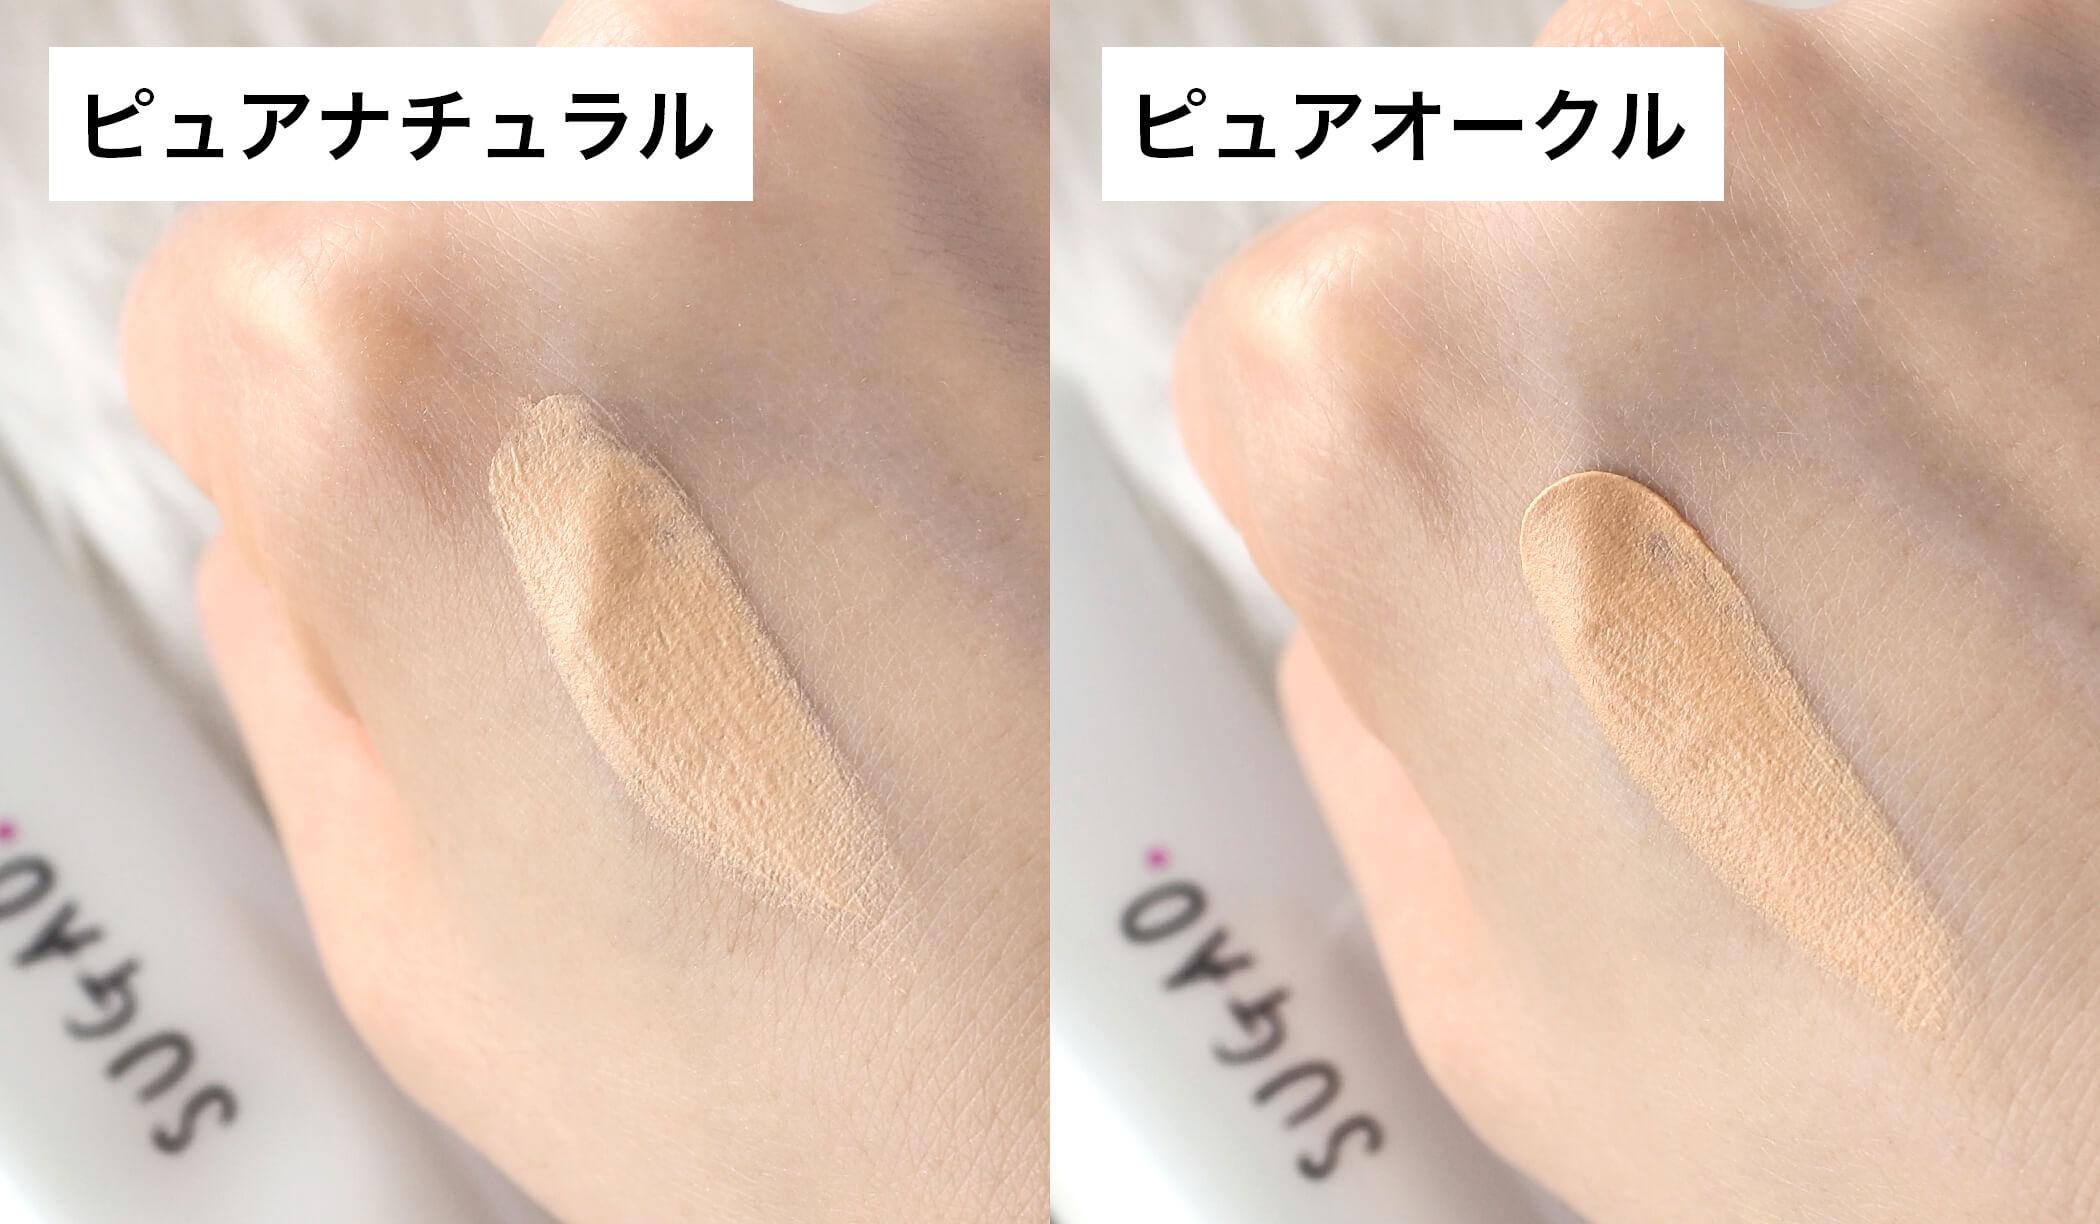 Sugao CC Cream 2019